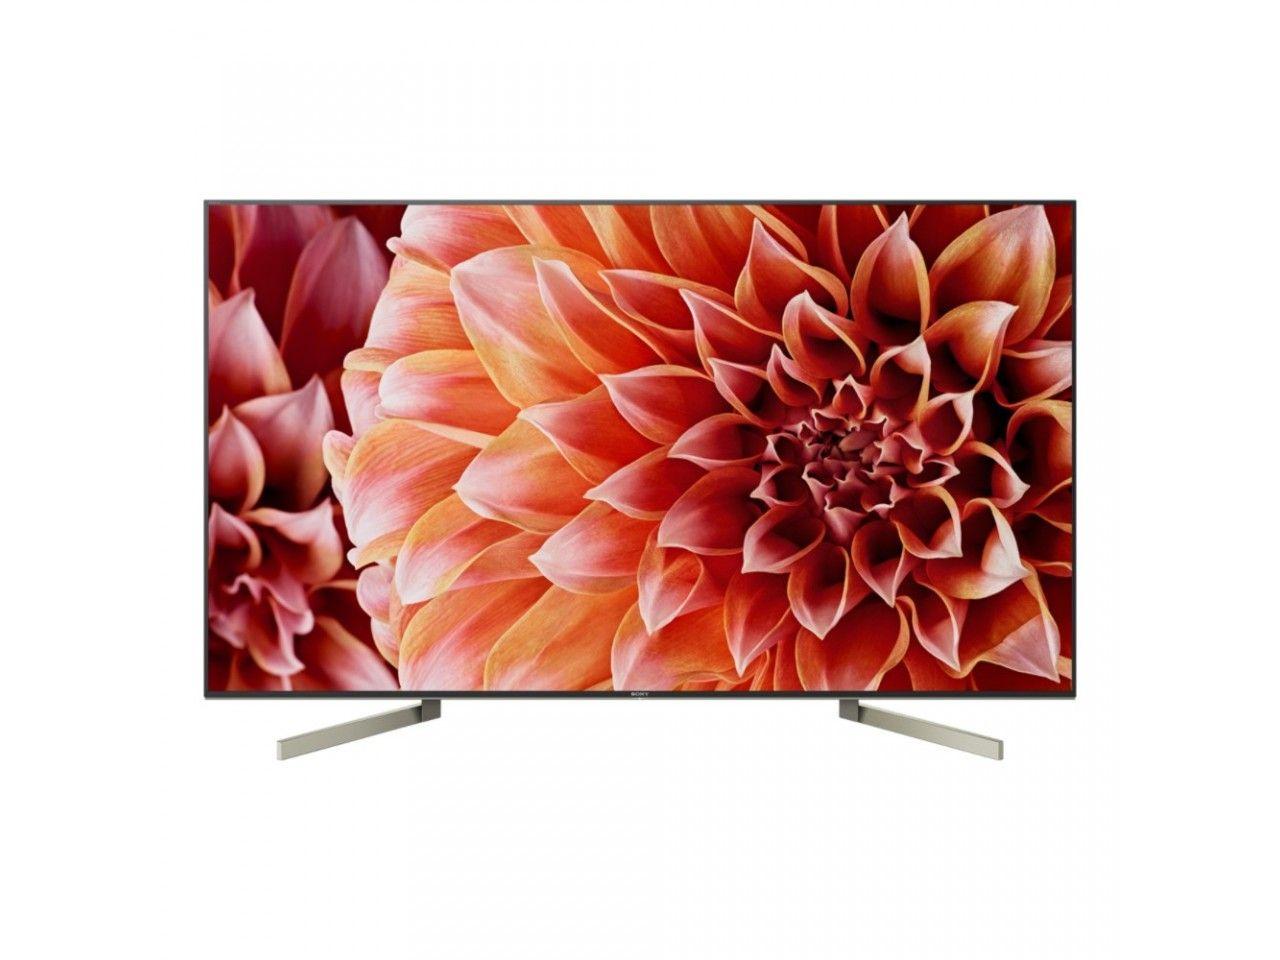 "TV 65"" Sony KD-65XF9005 - 4K UHD, LED, Smart TV"